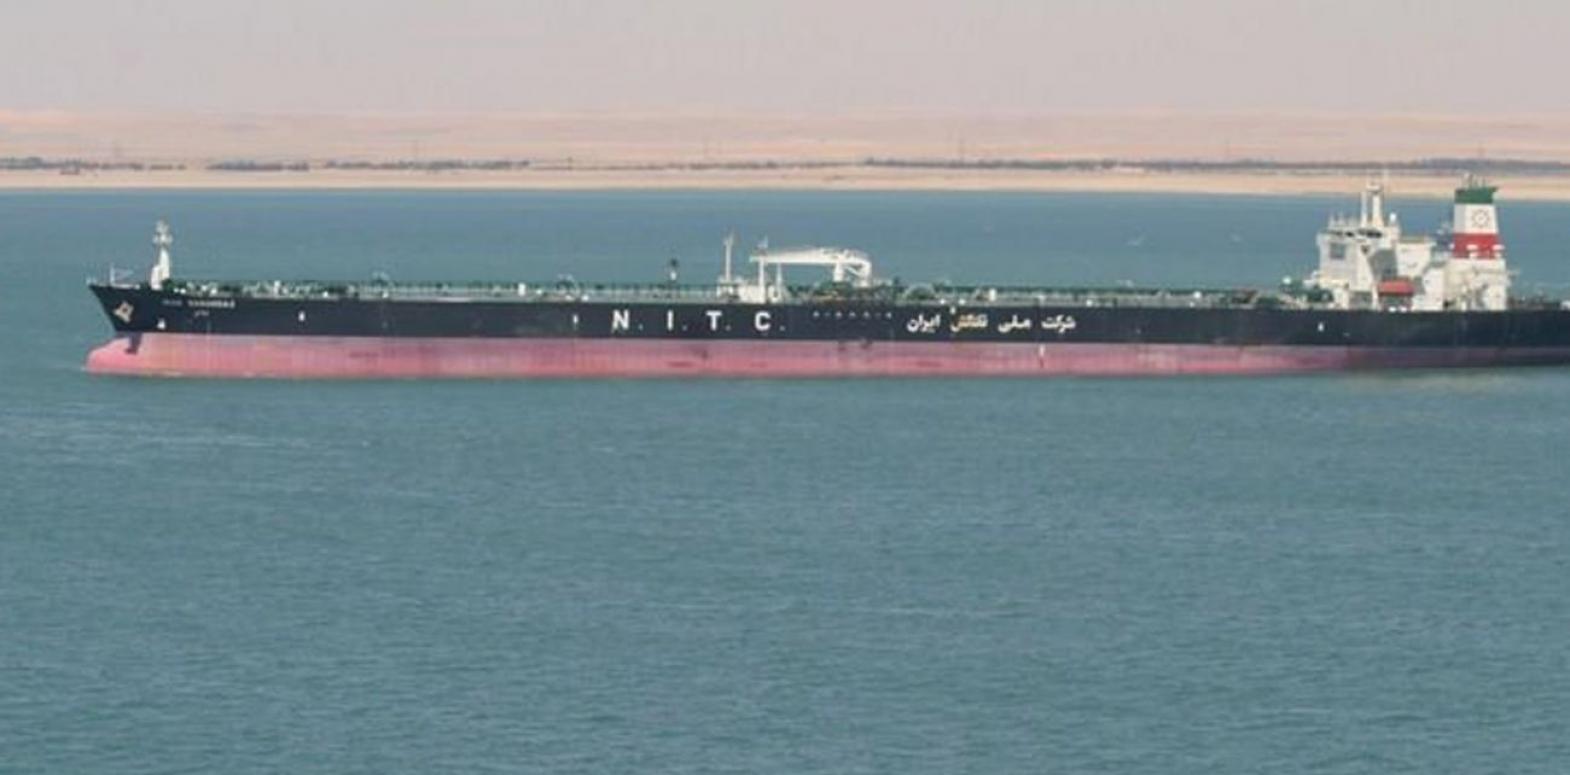 Нефть дешевеет из-за распространения COVID-19 в Китае